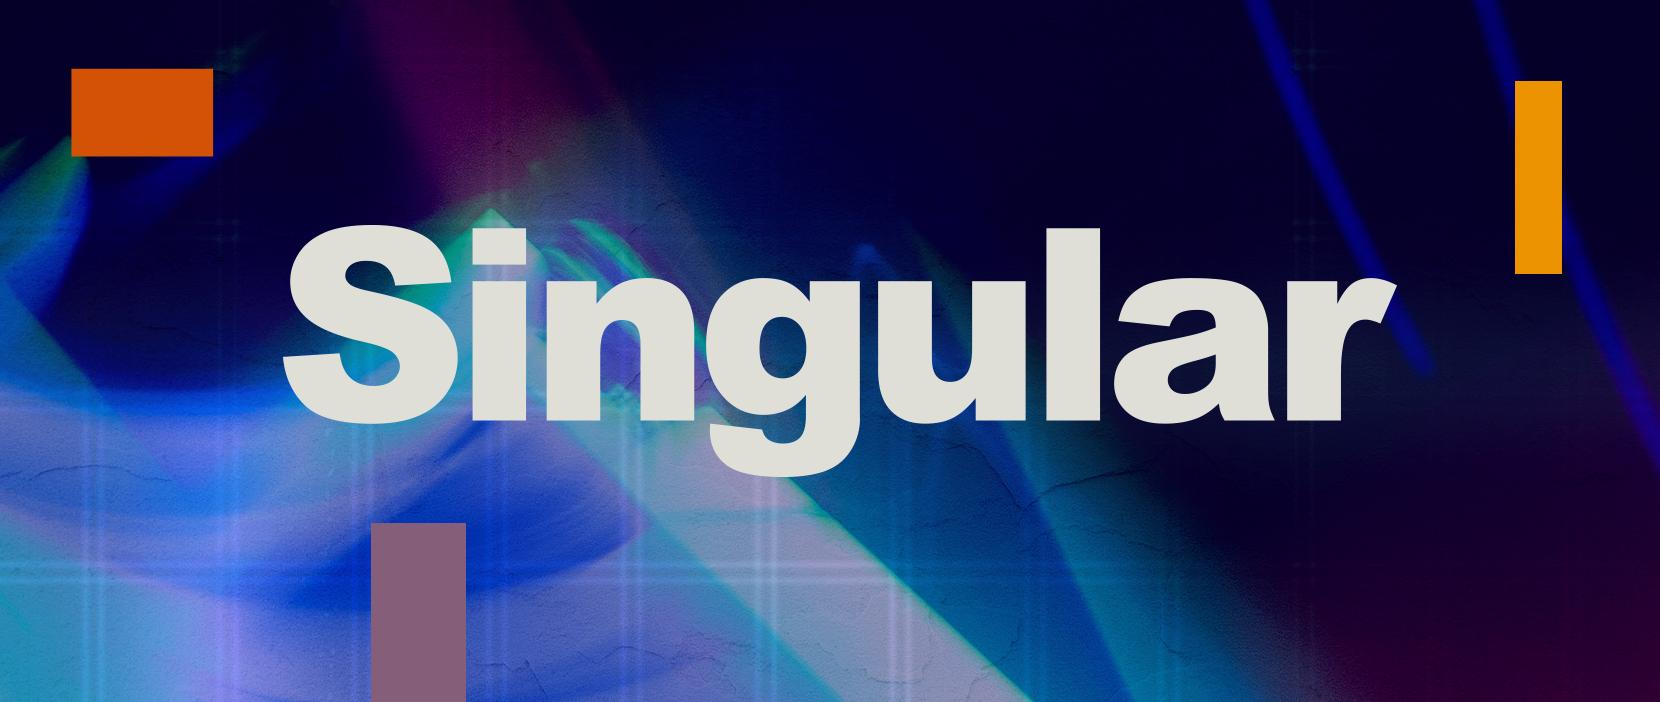 Main image for Singular